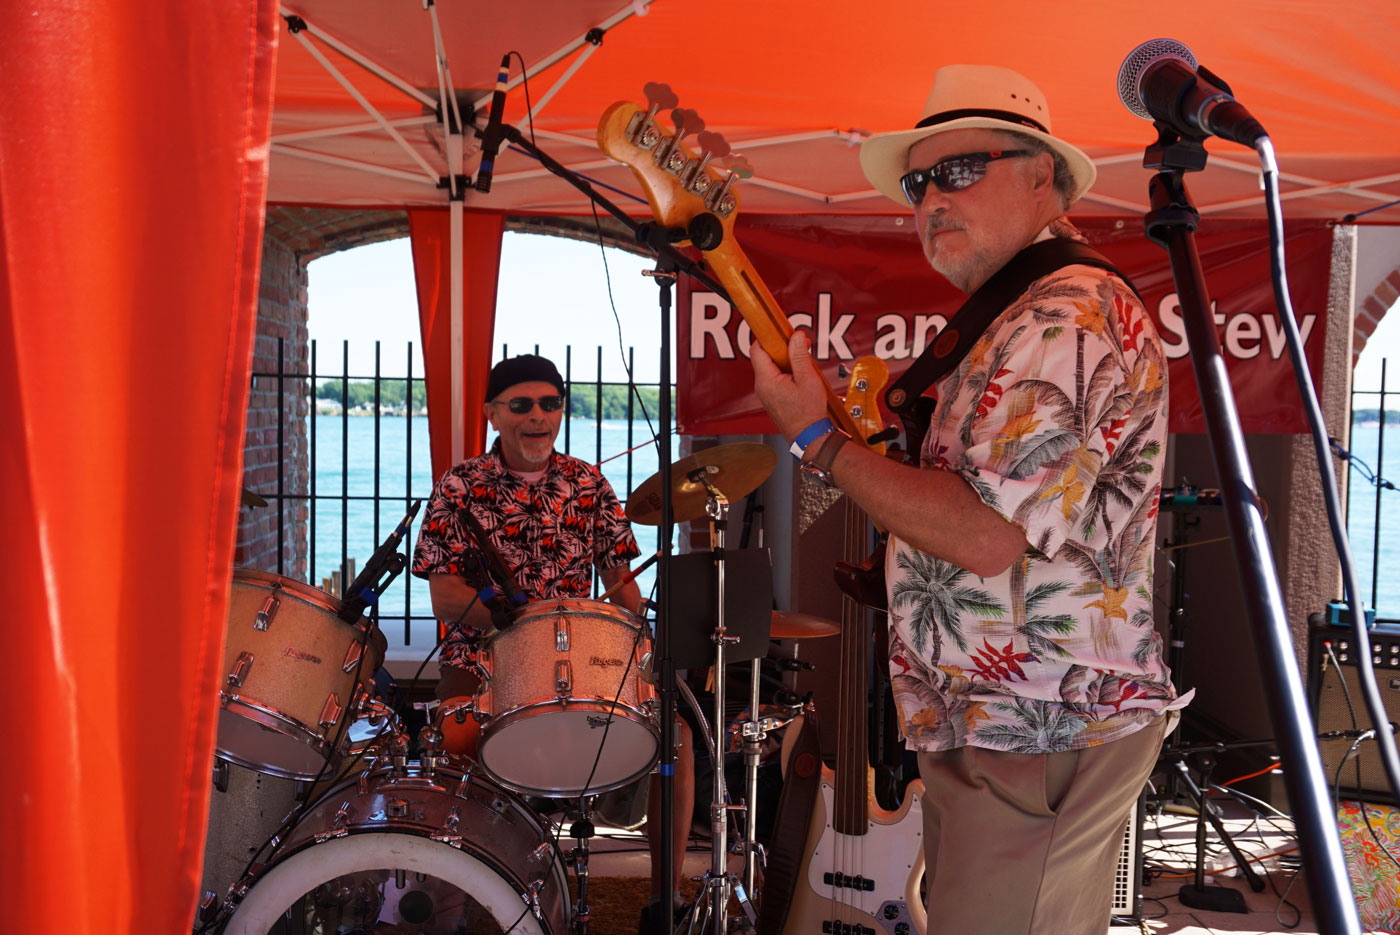 Rock & Roll Stew performing.